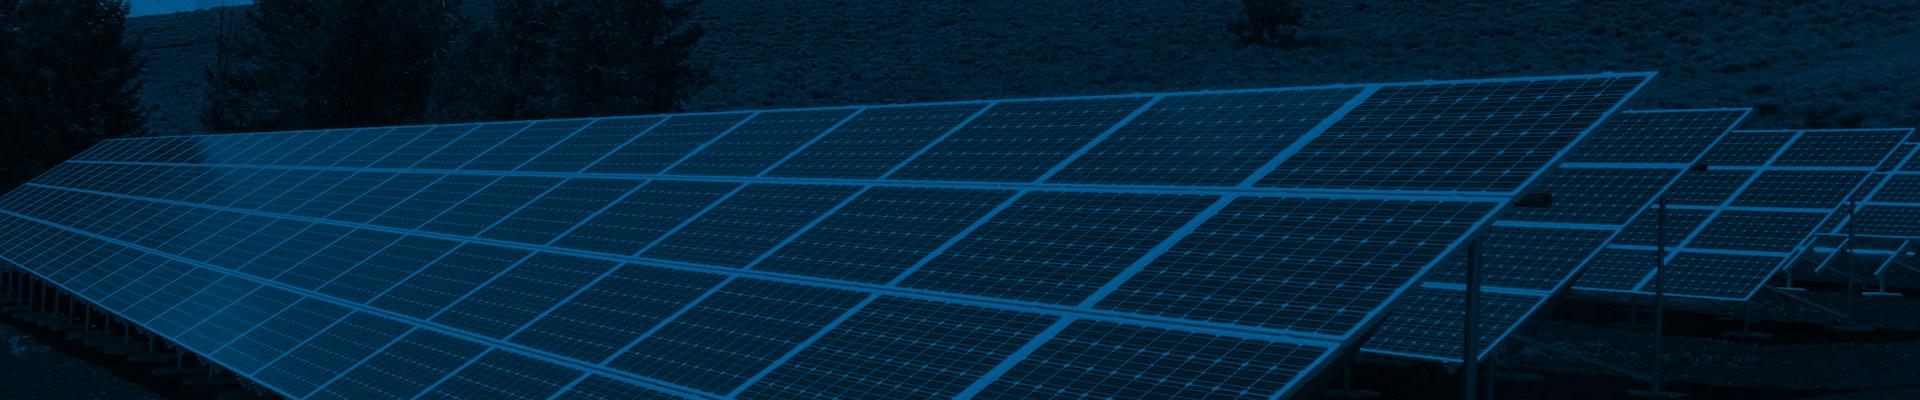 Energiís renovables Vitoria